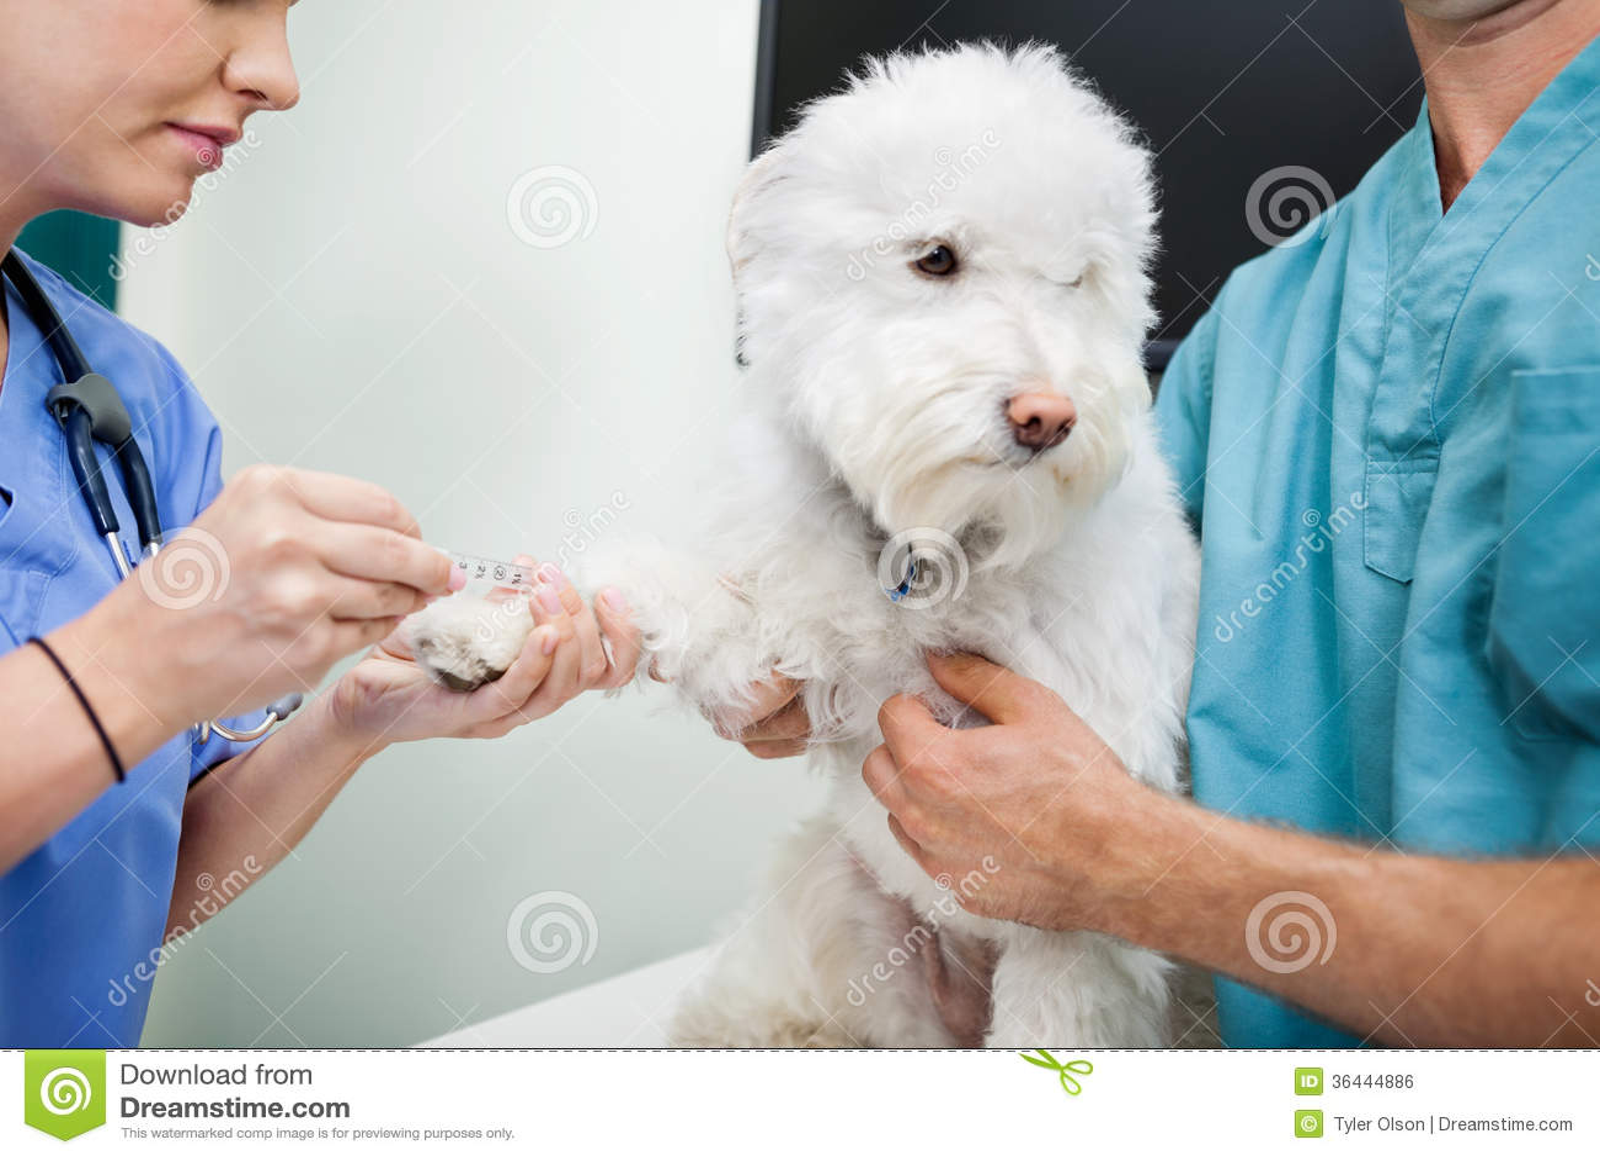 2 doctors team up on blonde milf